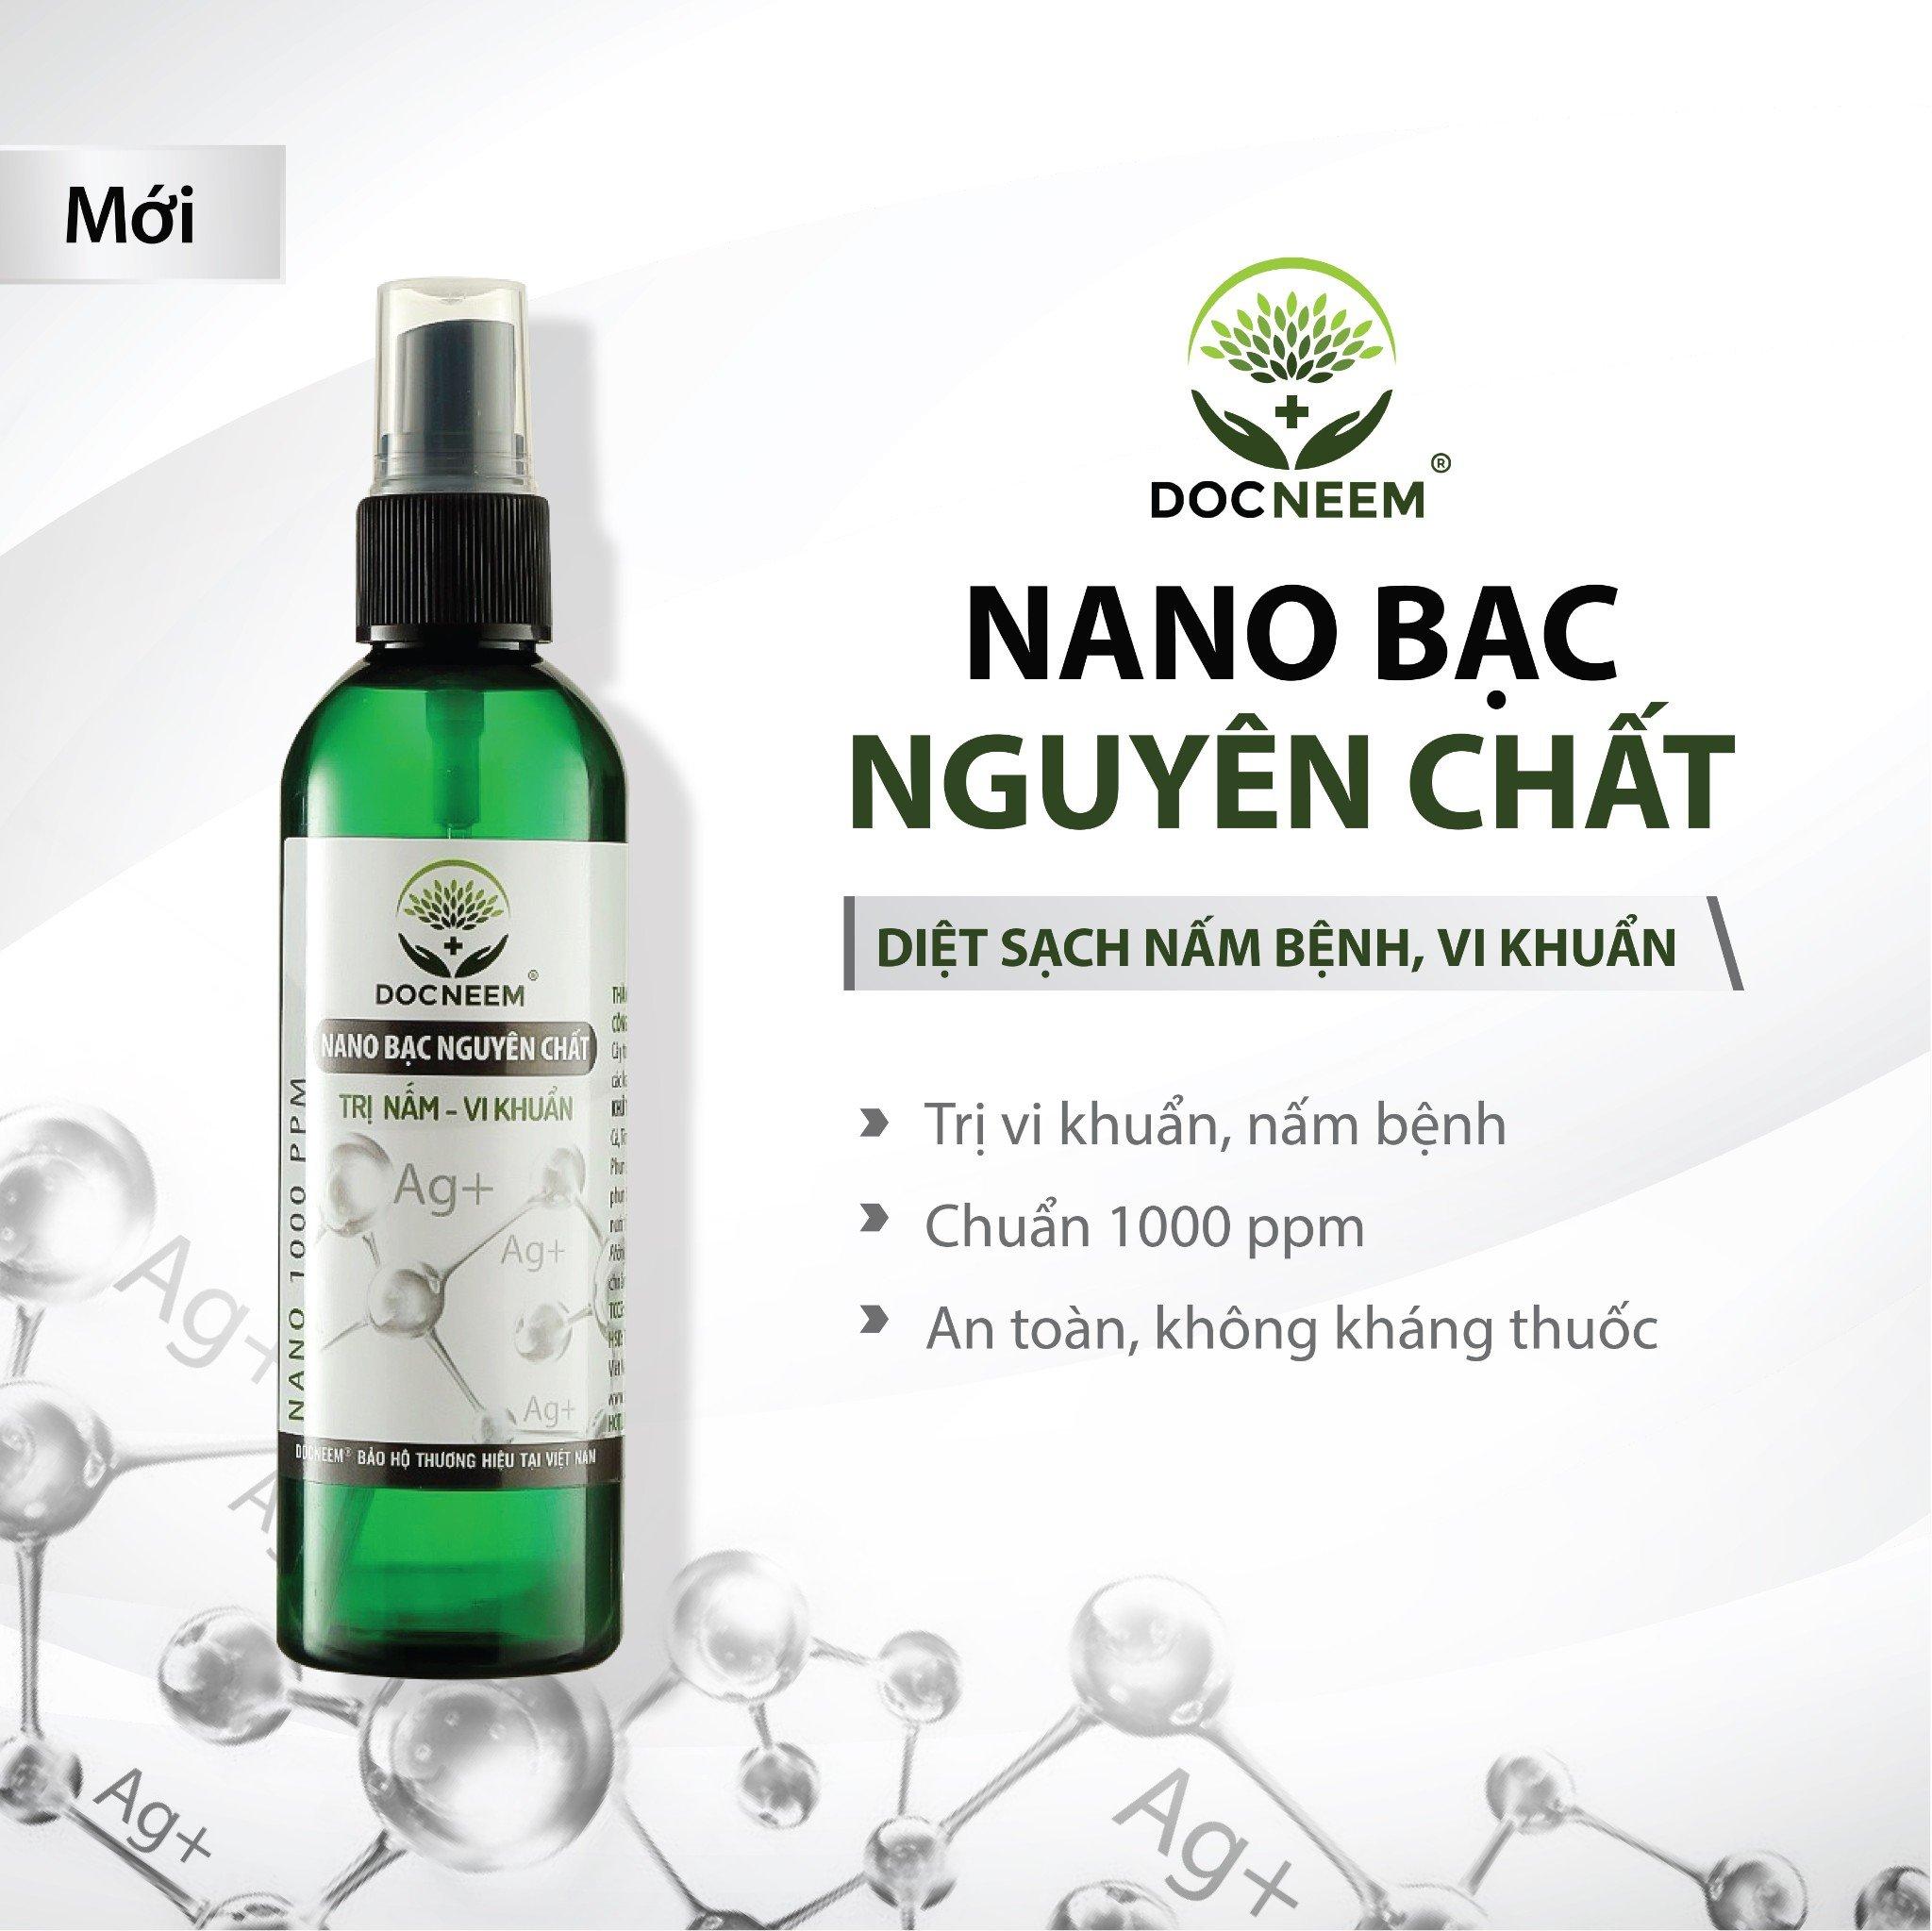 Nano-bac-diet-sach-nam-benh-vi-khuan-hoa-hong-hoa-lan-docneem-100ml